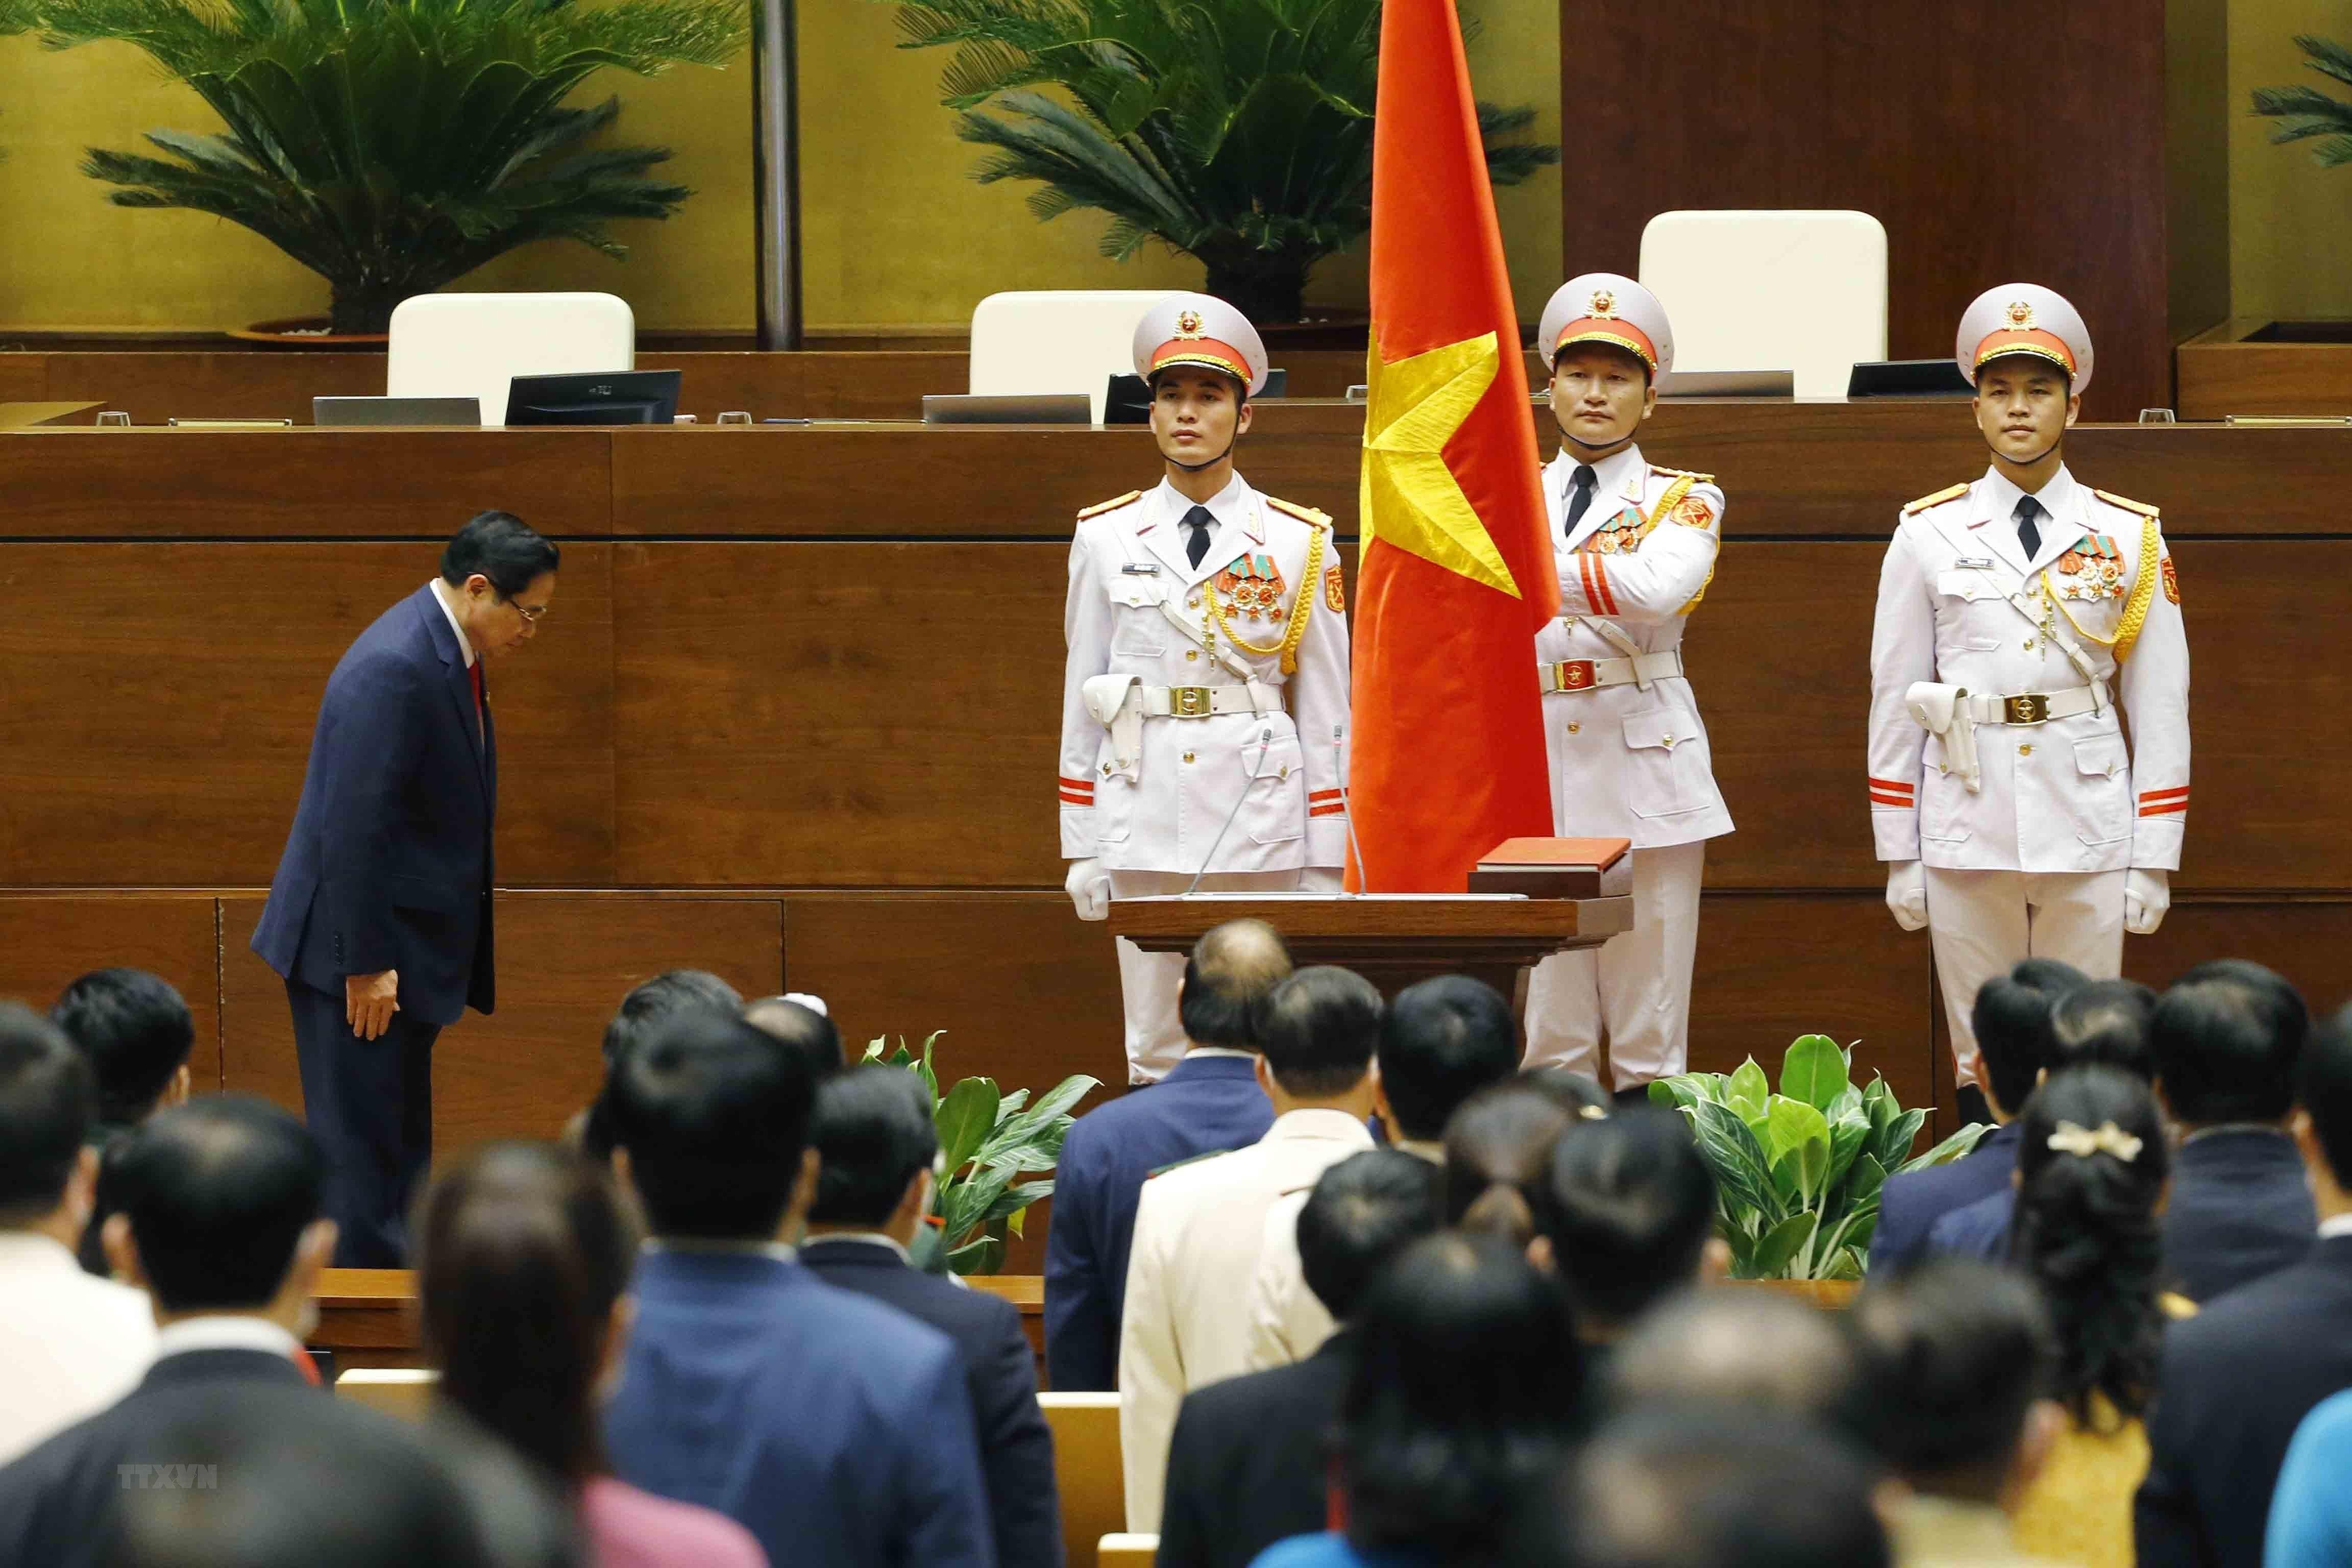 Hinh anh ong Pham Minh Chinh nham chuc Thu tuong Chinh phu hinh anh 7